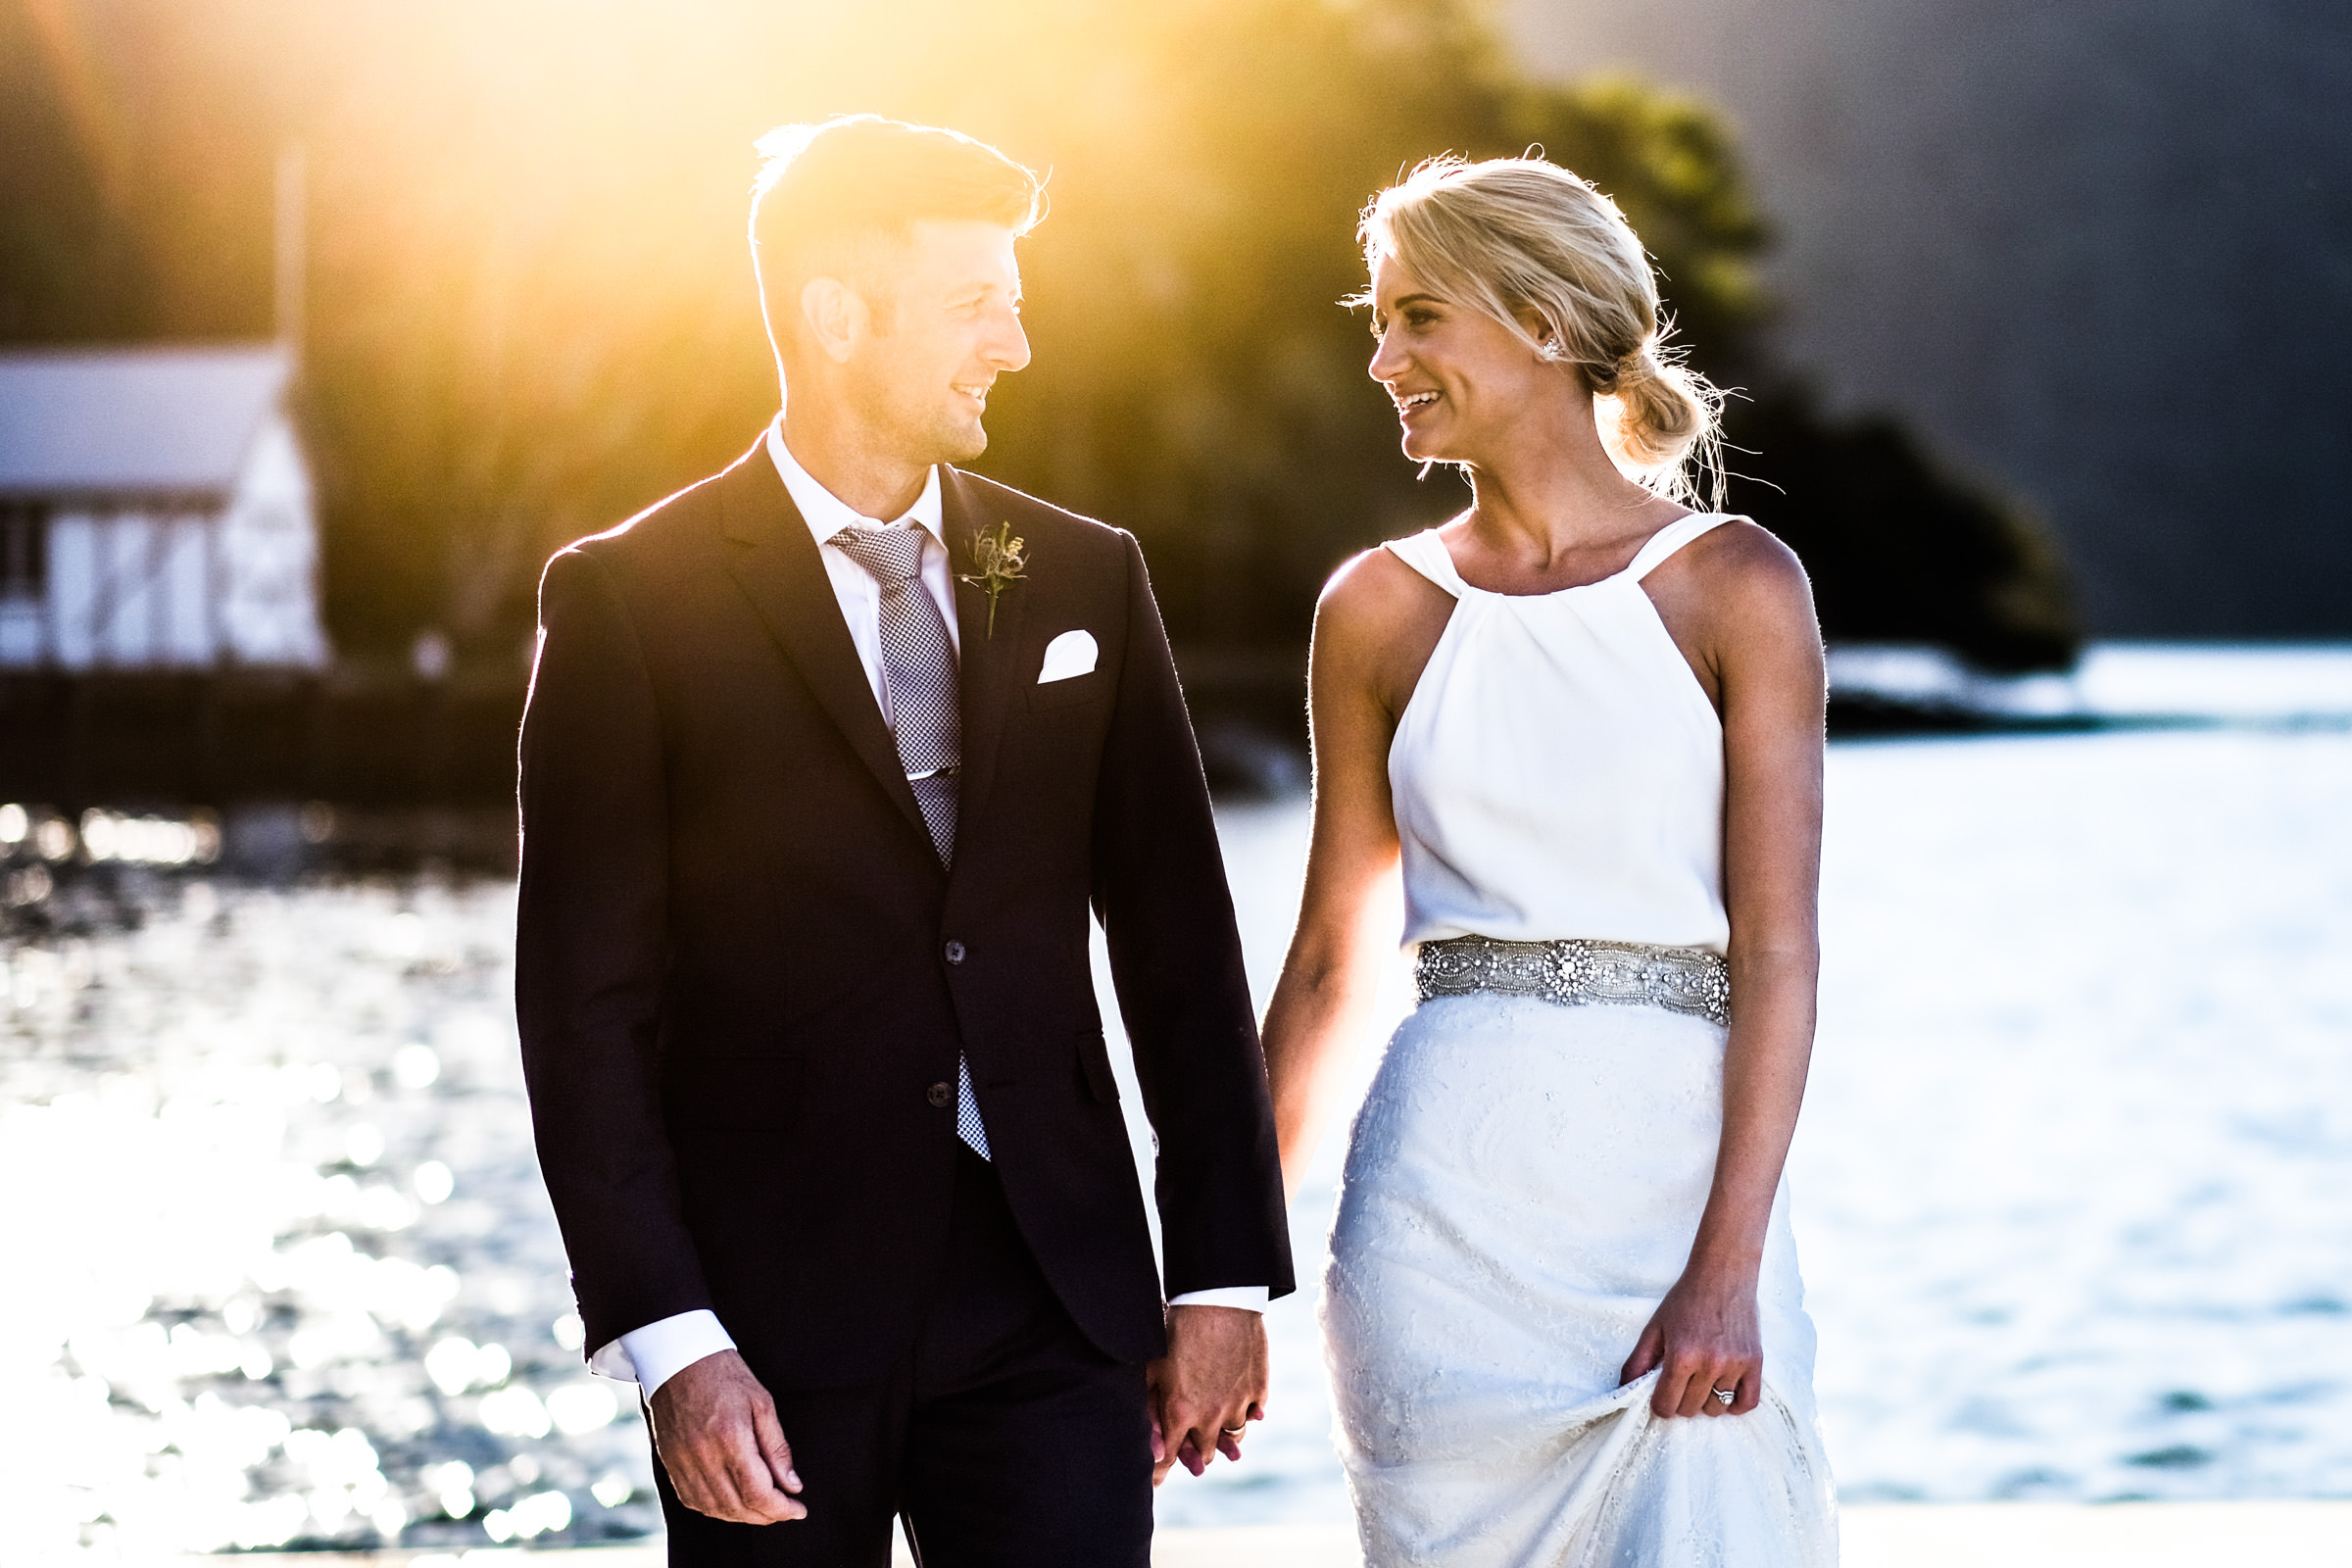 Peats+Bite+Wedding+Photography+020.jpg